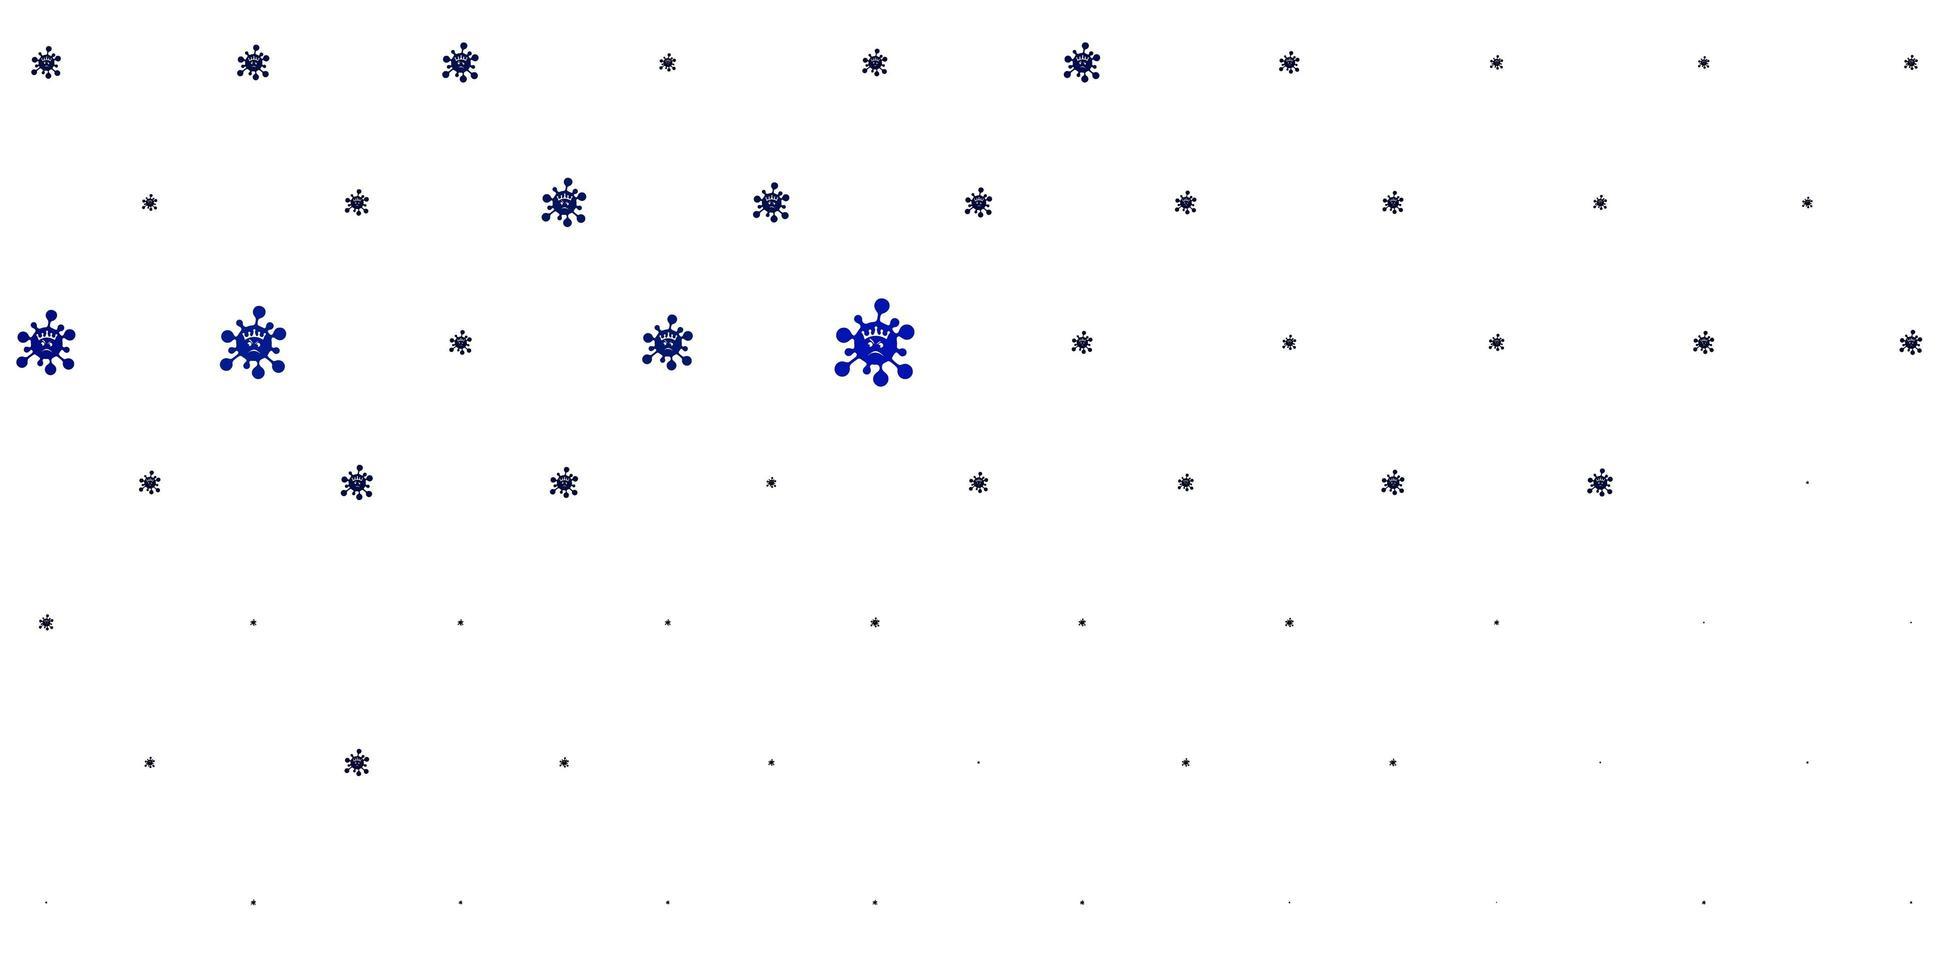 texture de vecteur bleu clair avec des symboles de la maladie.